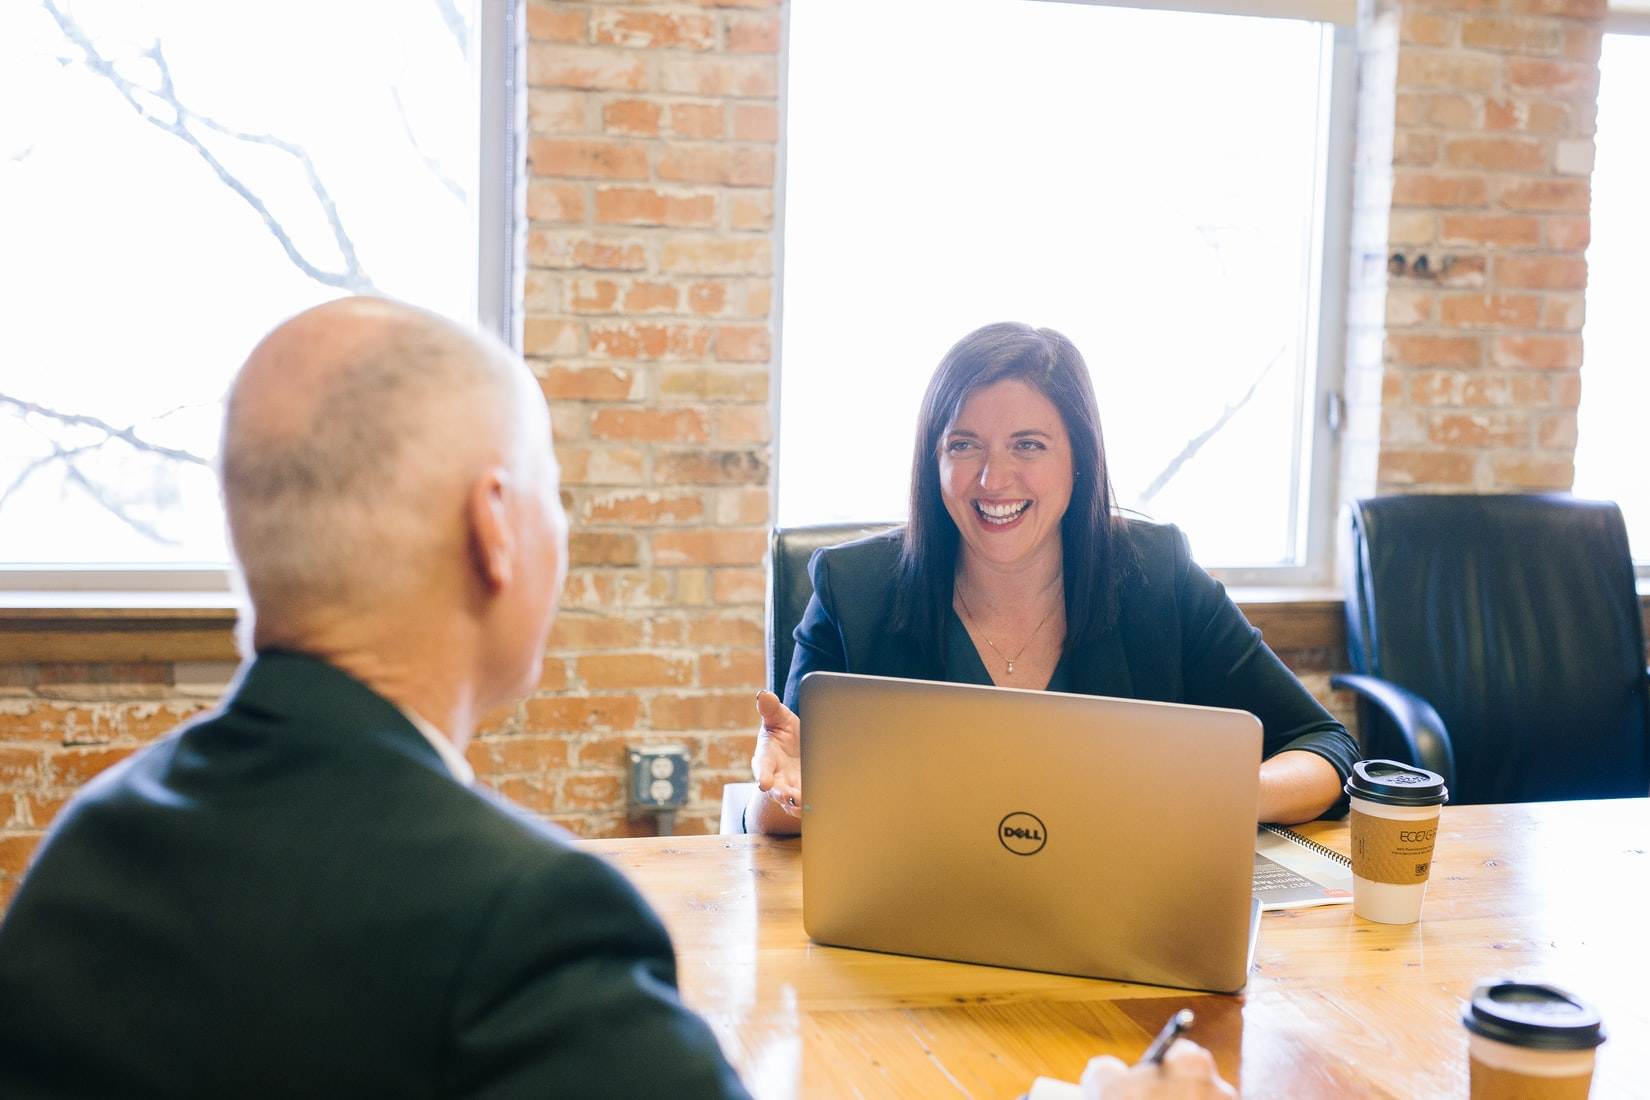 Female advisor smiling with laptop